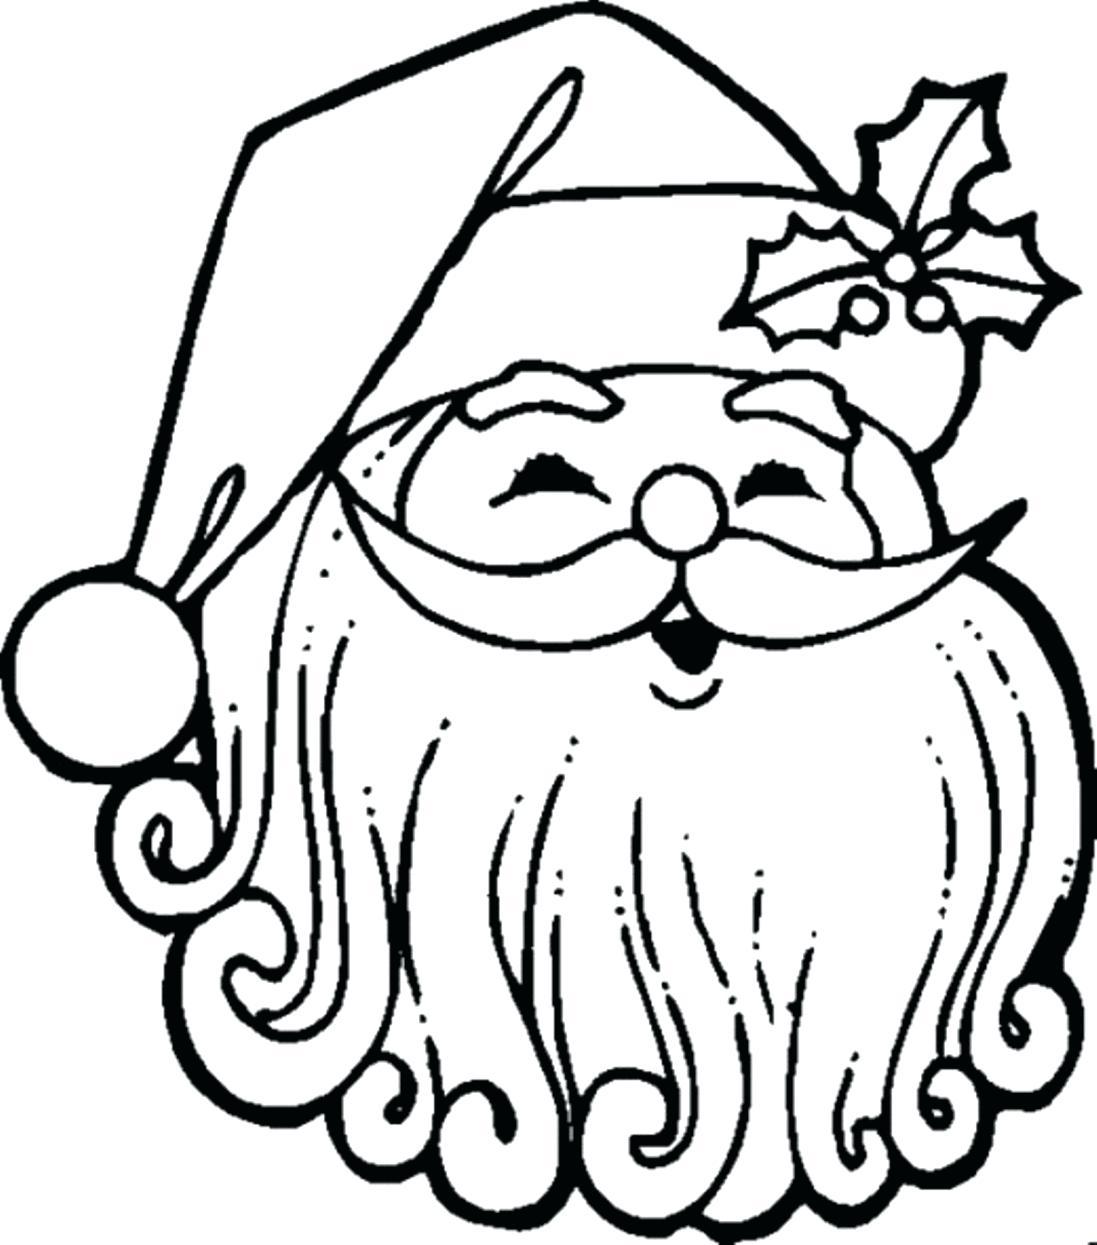 1097x1245 Coloring Coloring Pages Santa Claus